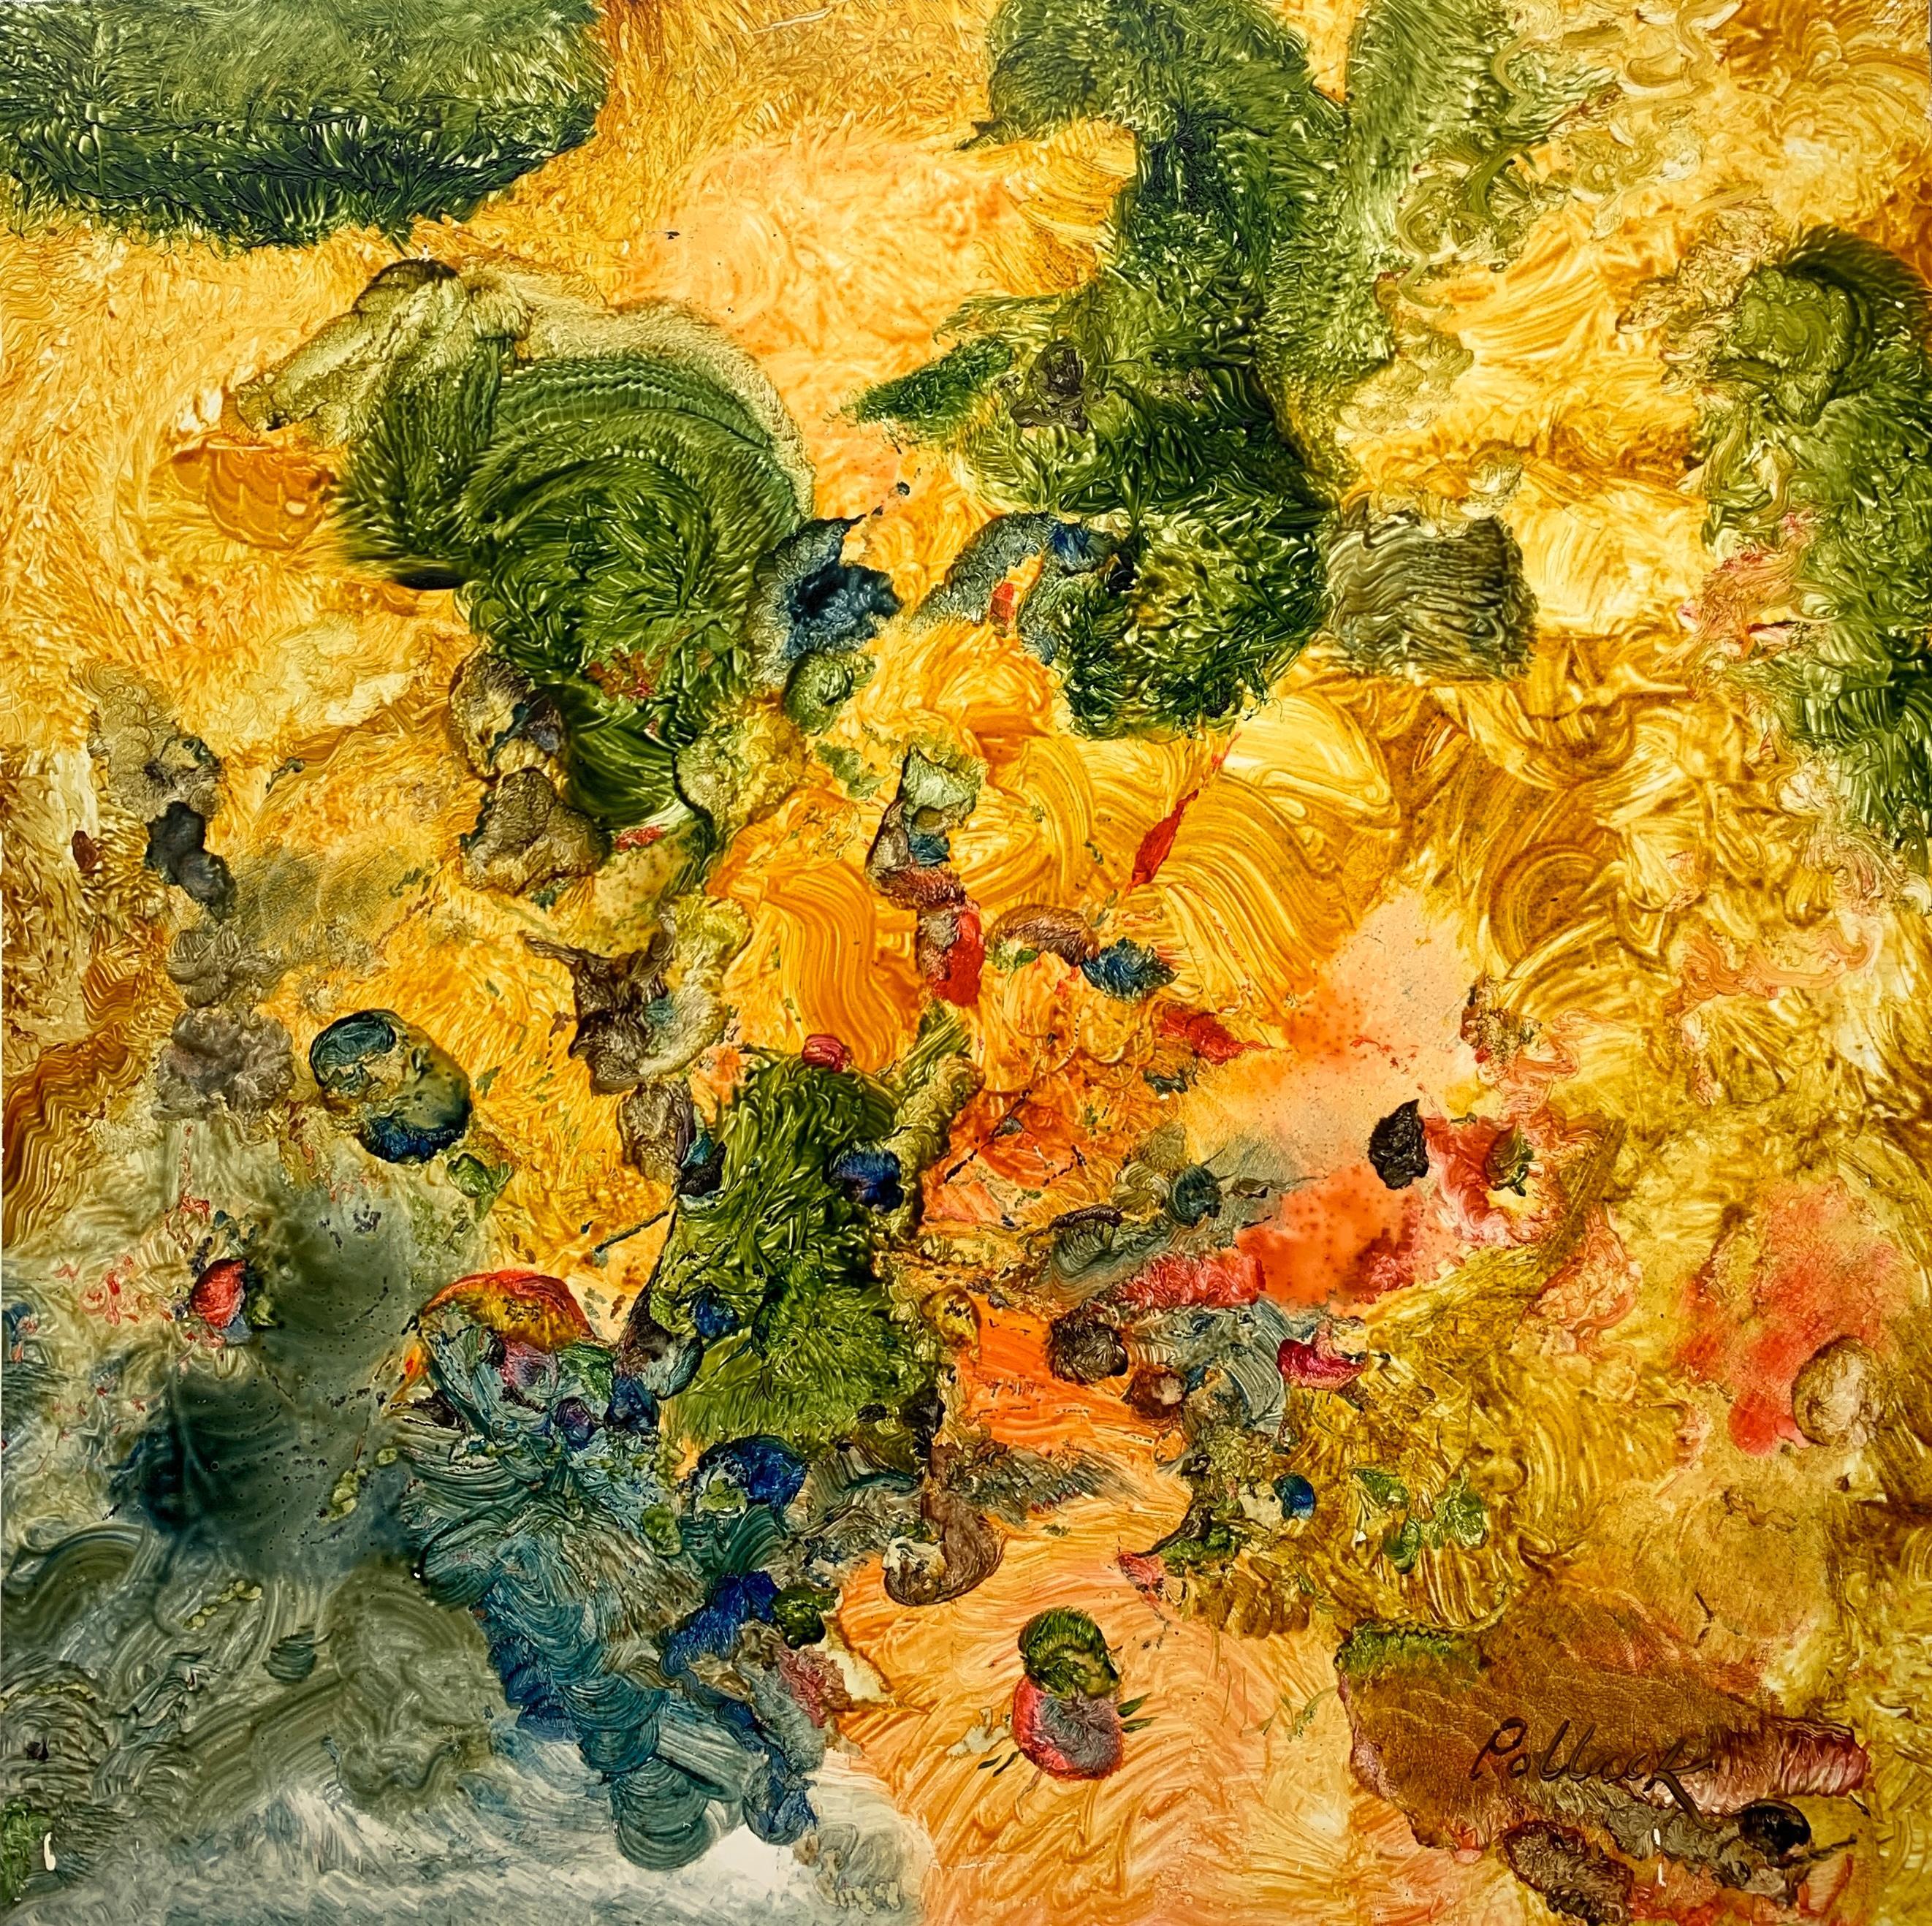 Entrance to the Yellow Garden, Reginald Pollack Abstract Oil on Masonite